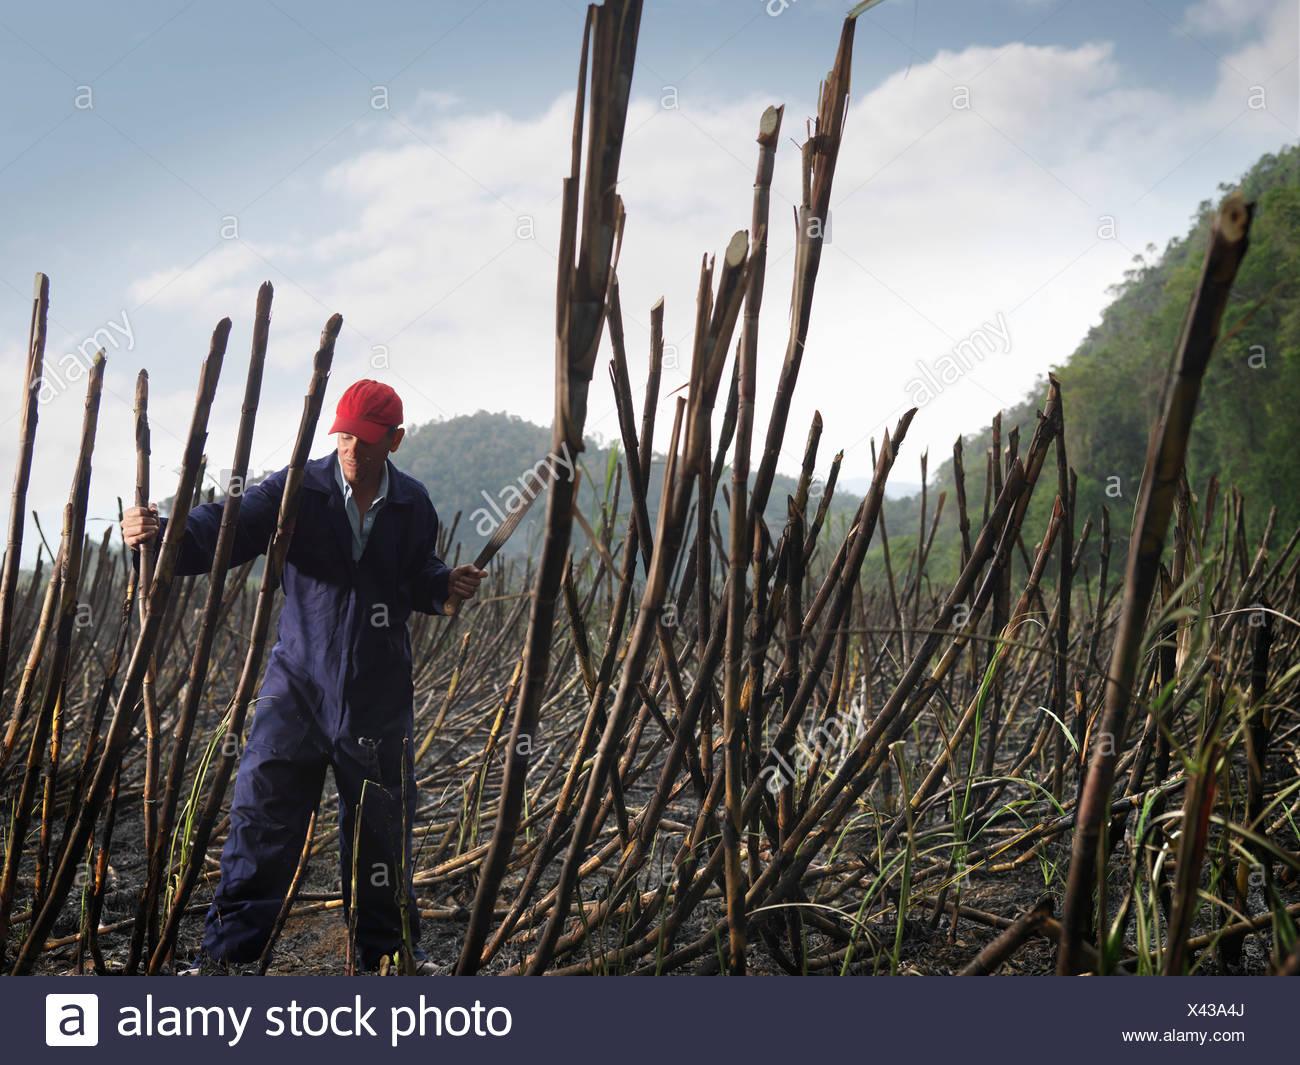 Worker Cutting Burnt Sugar Cane - Stock Image